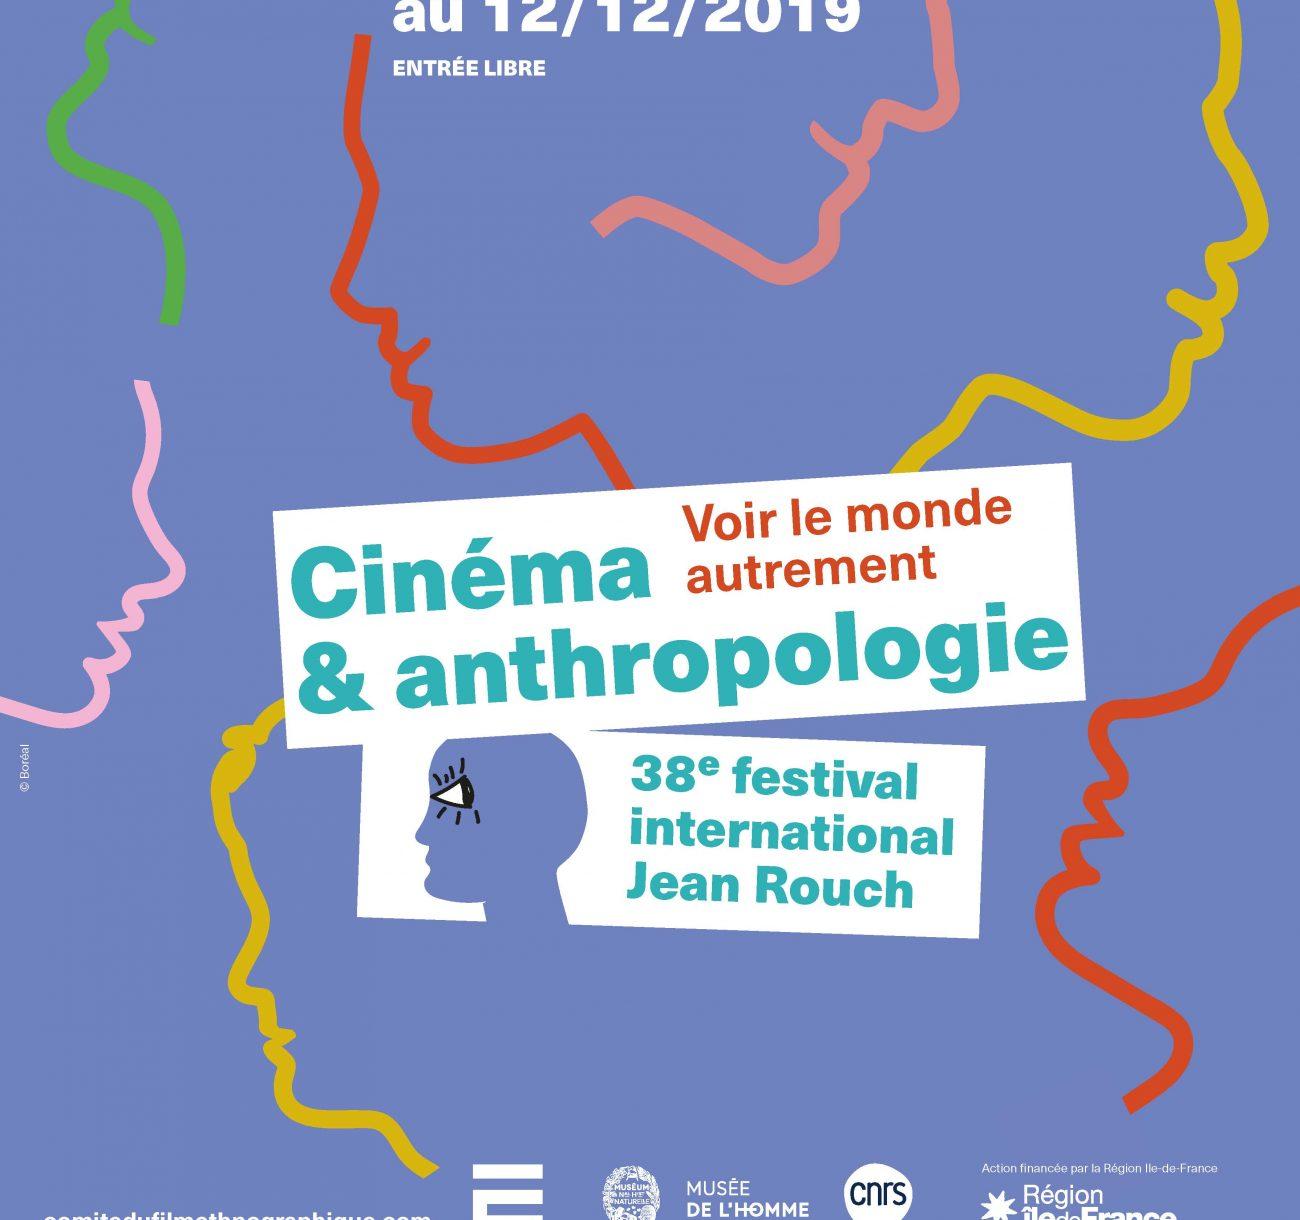 Le festival international Jean Rouch